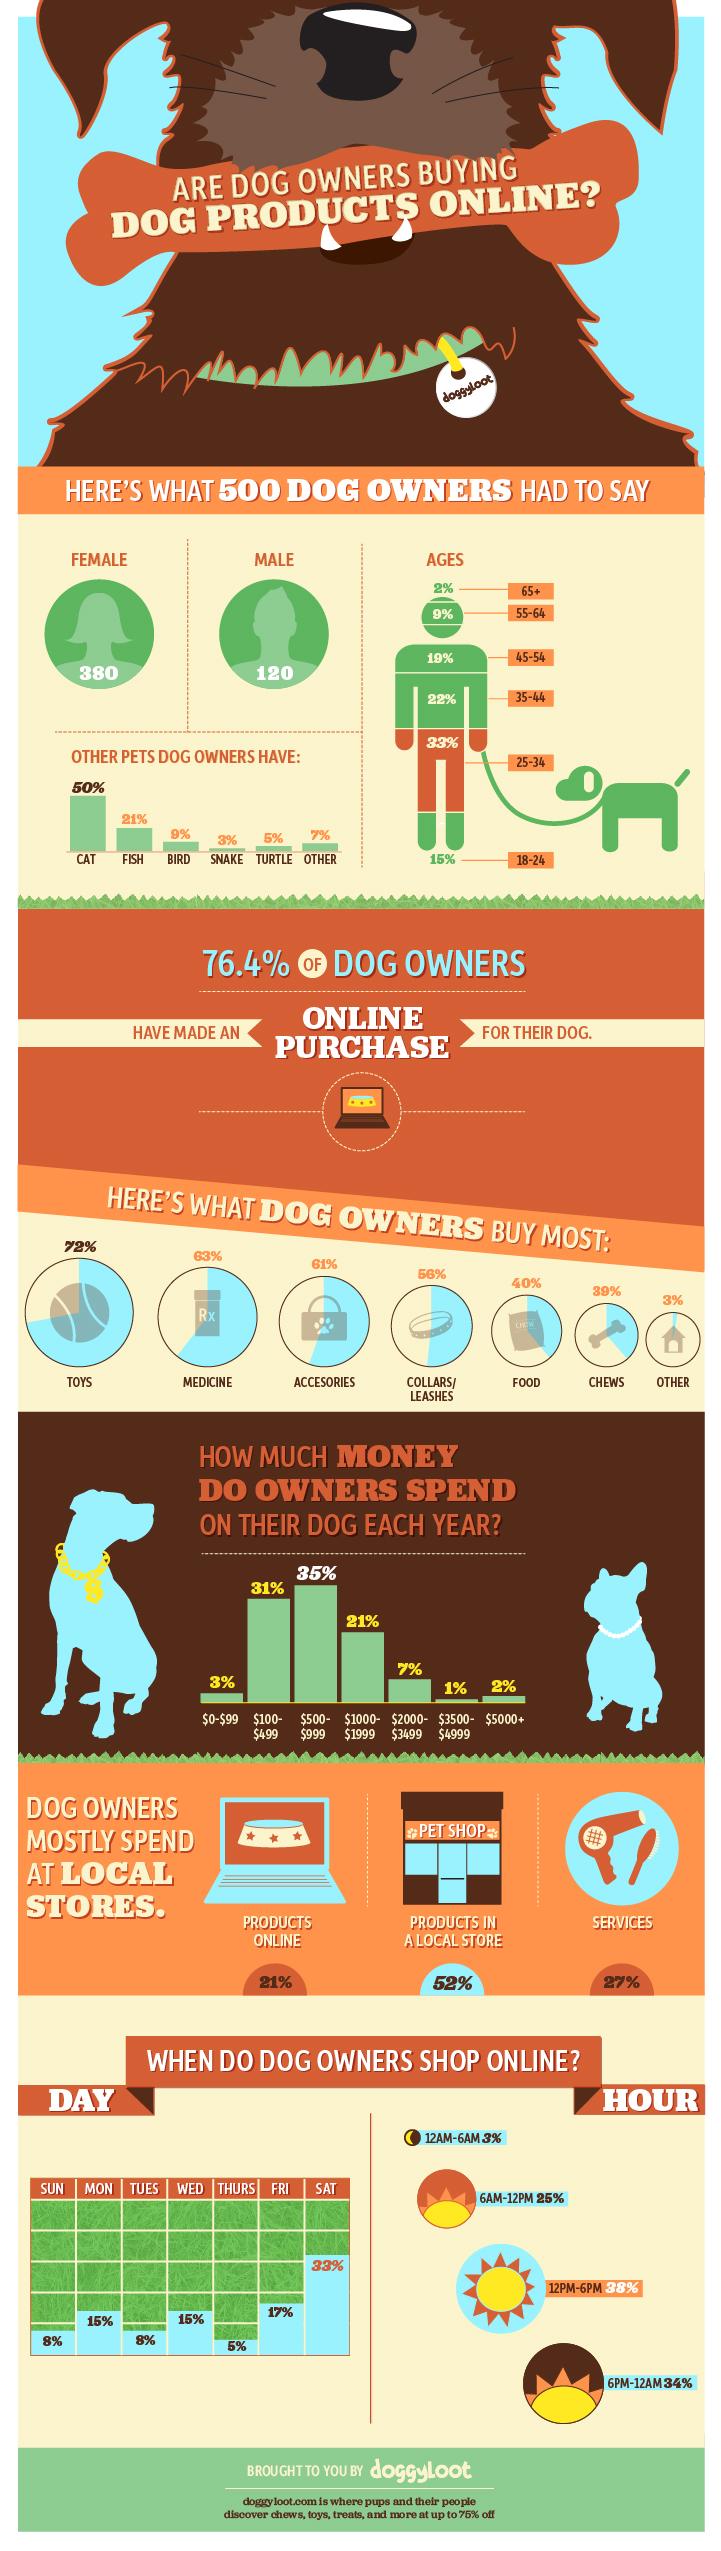 Dog Industry Consumer Online Trends